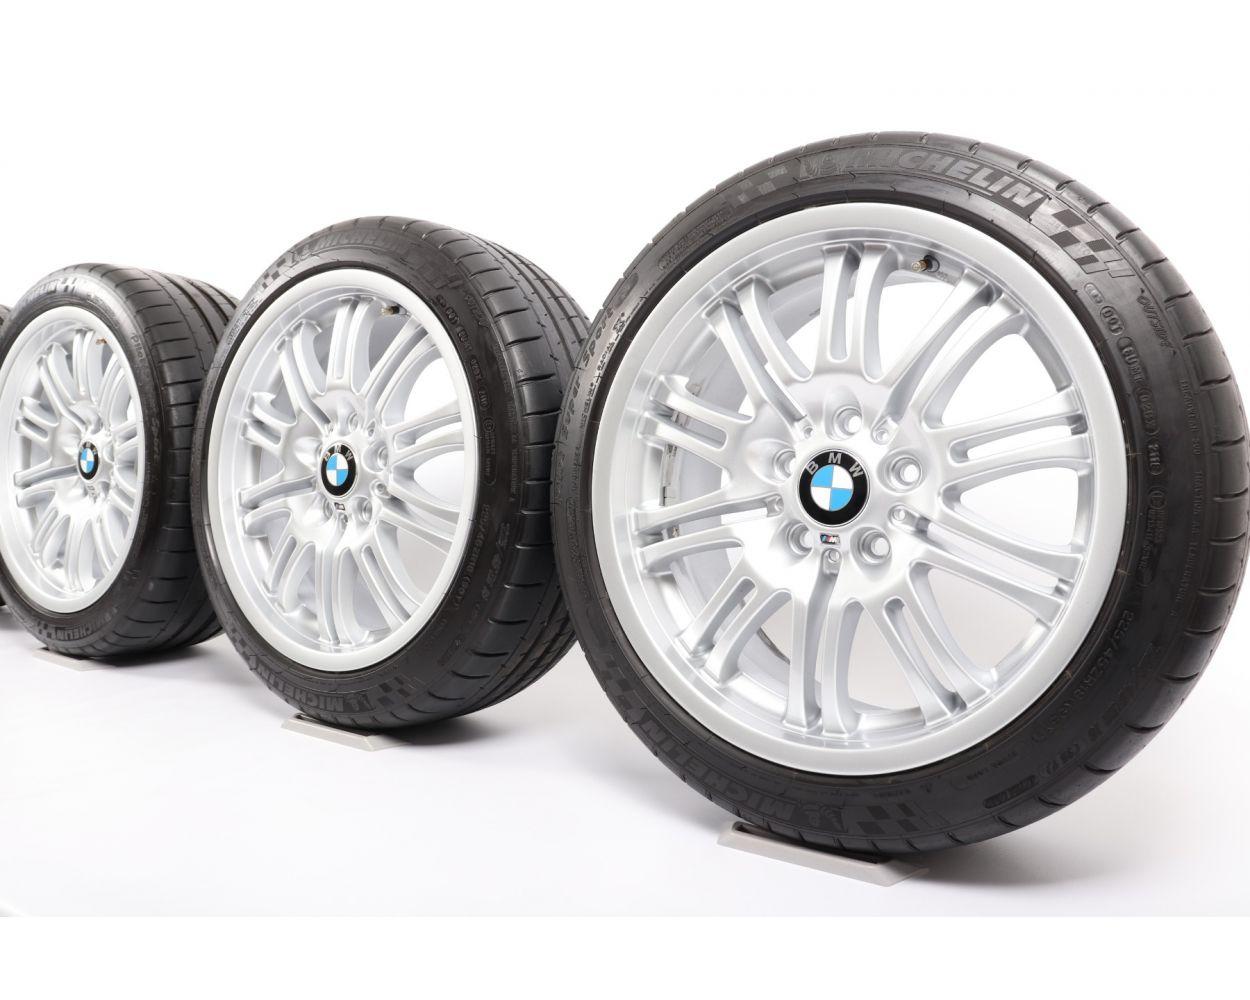 Bmw Winter Wheels 3er E36 E46 Z3 E36 16 Zoll Styling 43 Silber